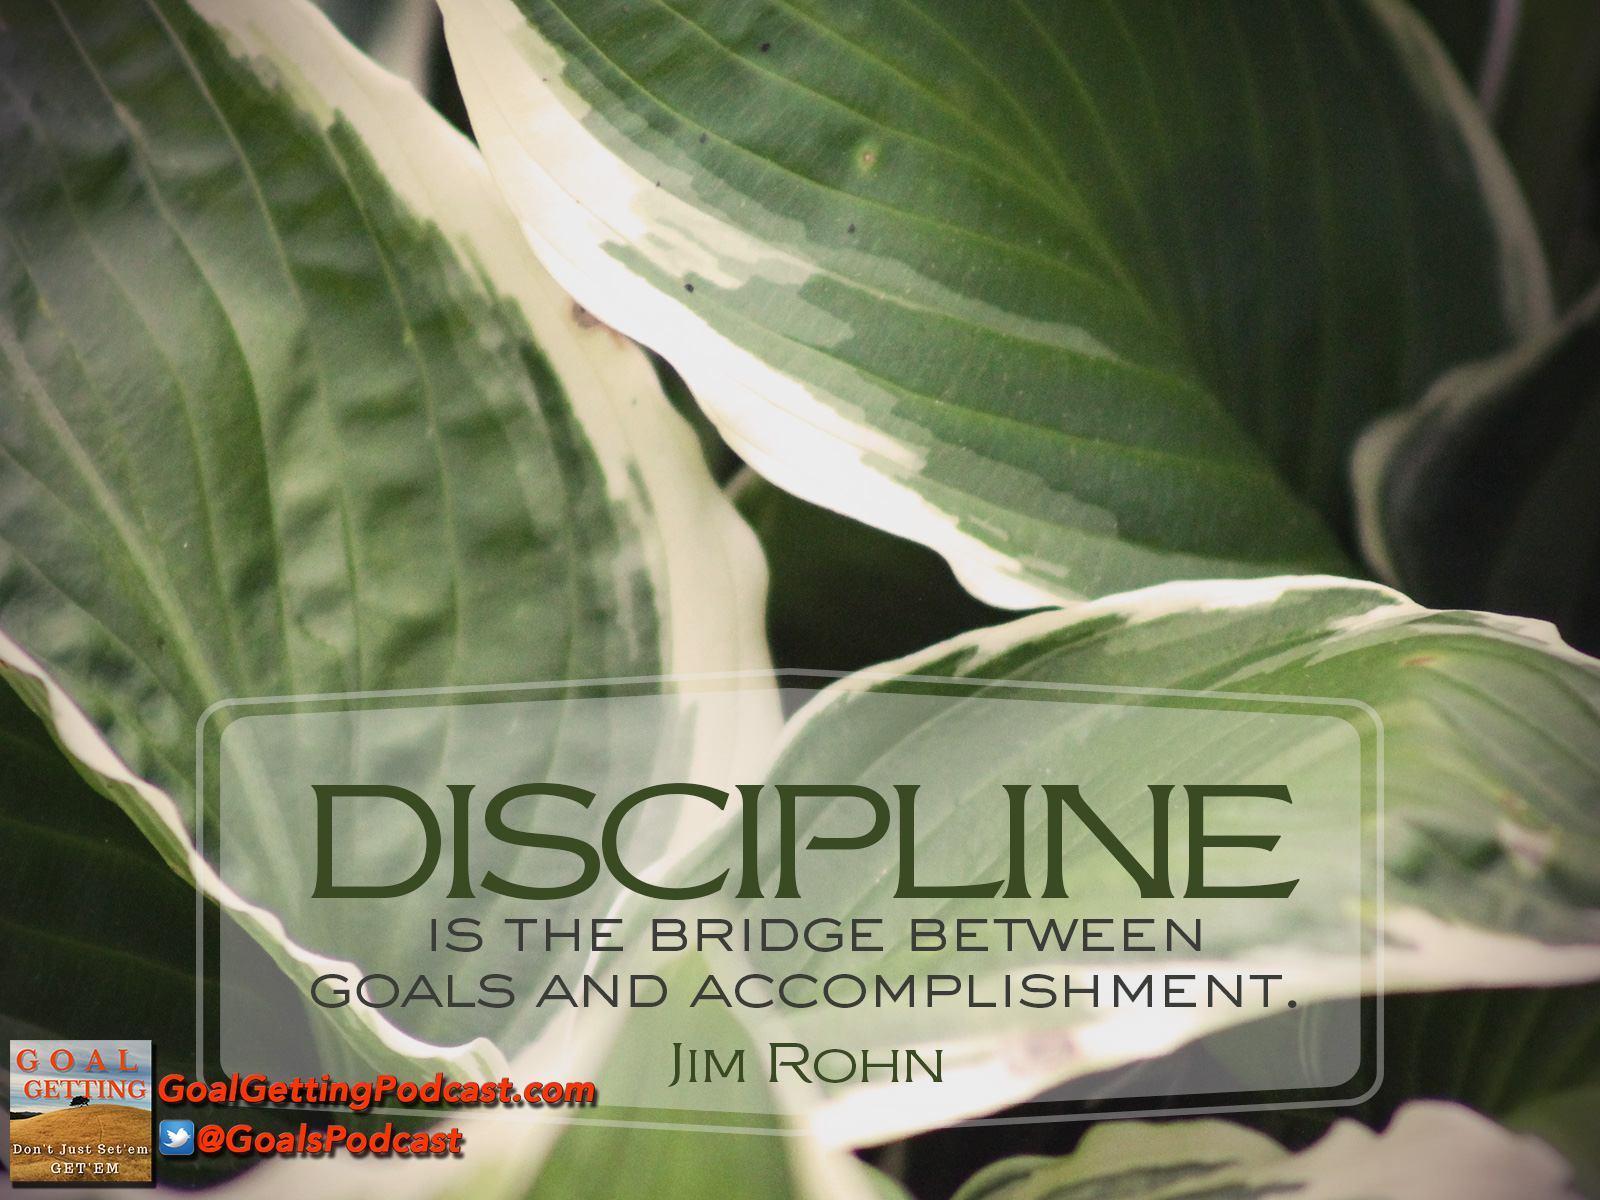 Discipline is the bridge between goals and accomplishment - Jim Rohn